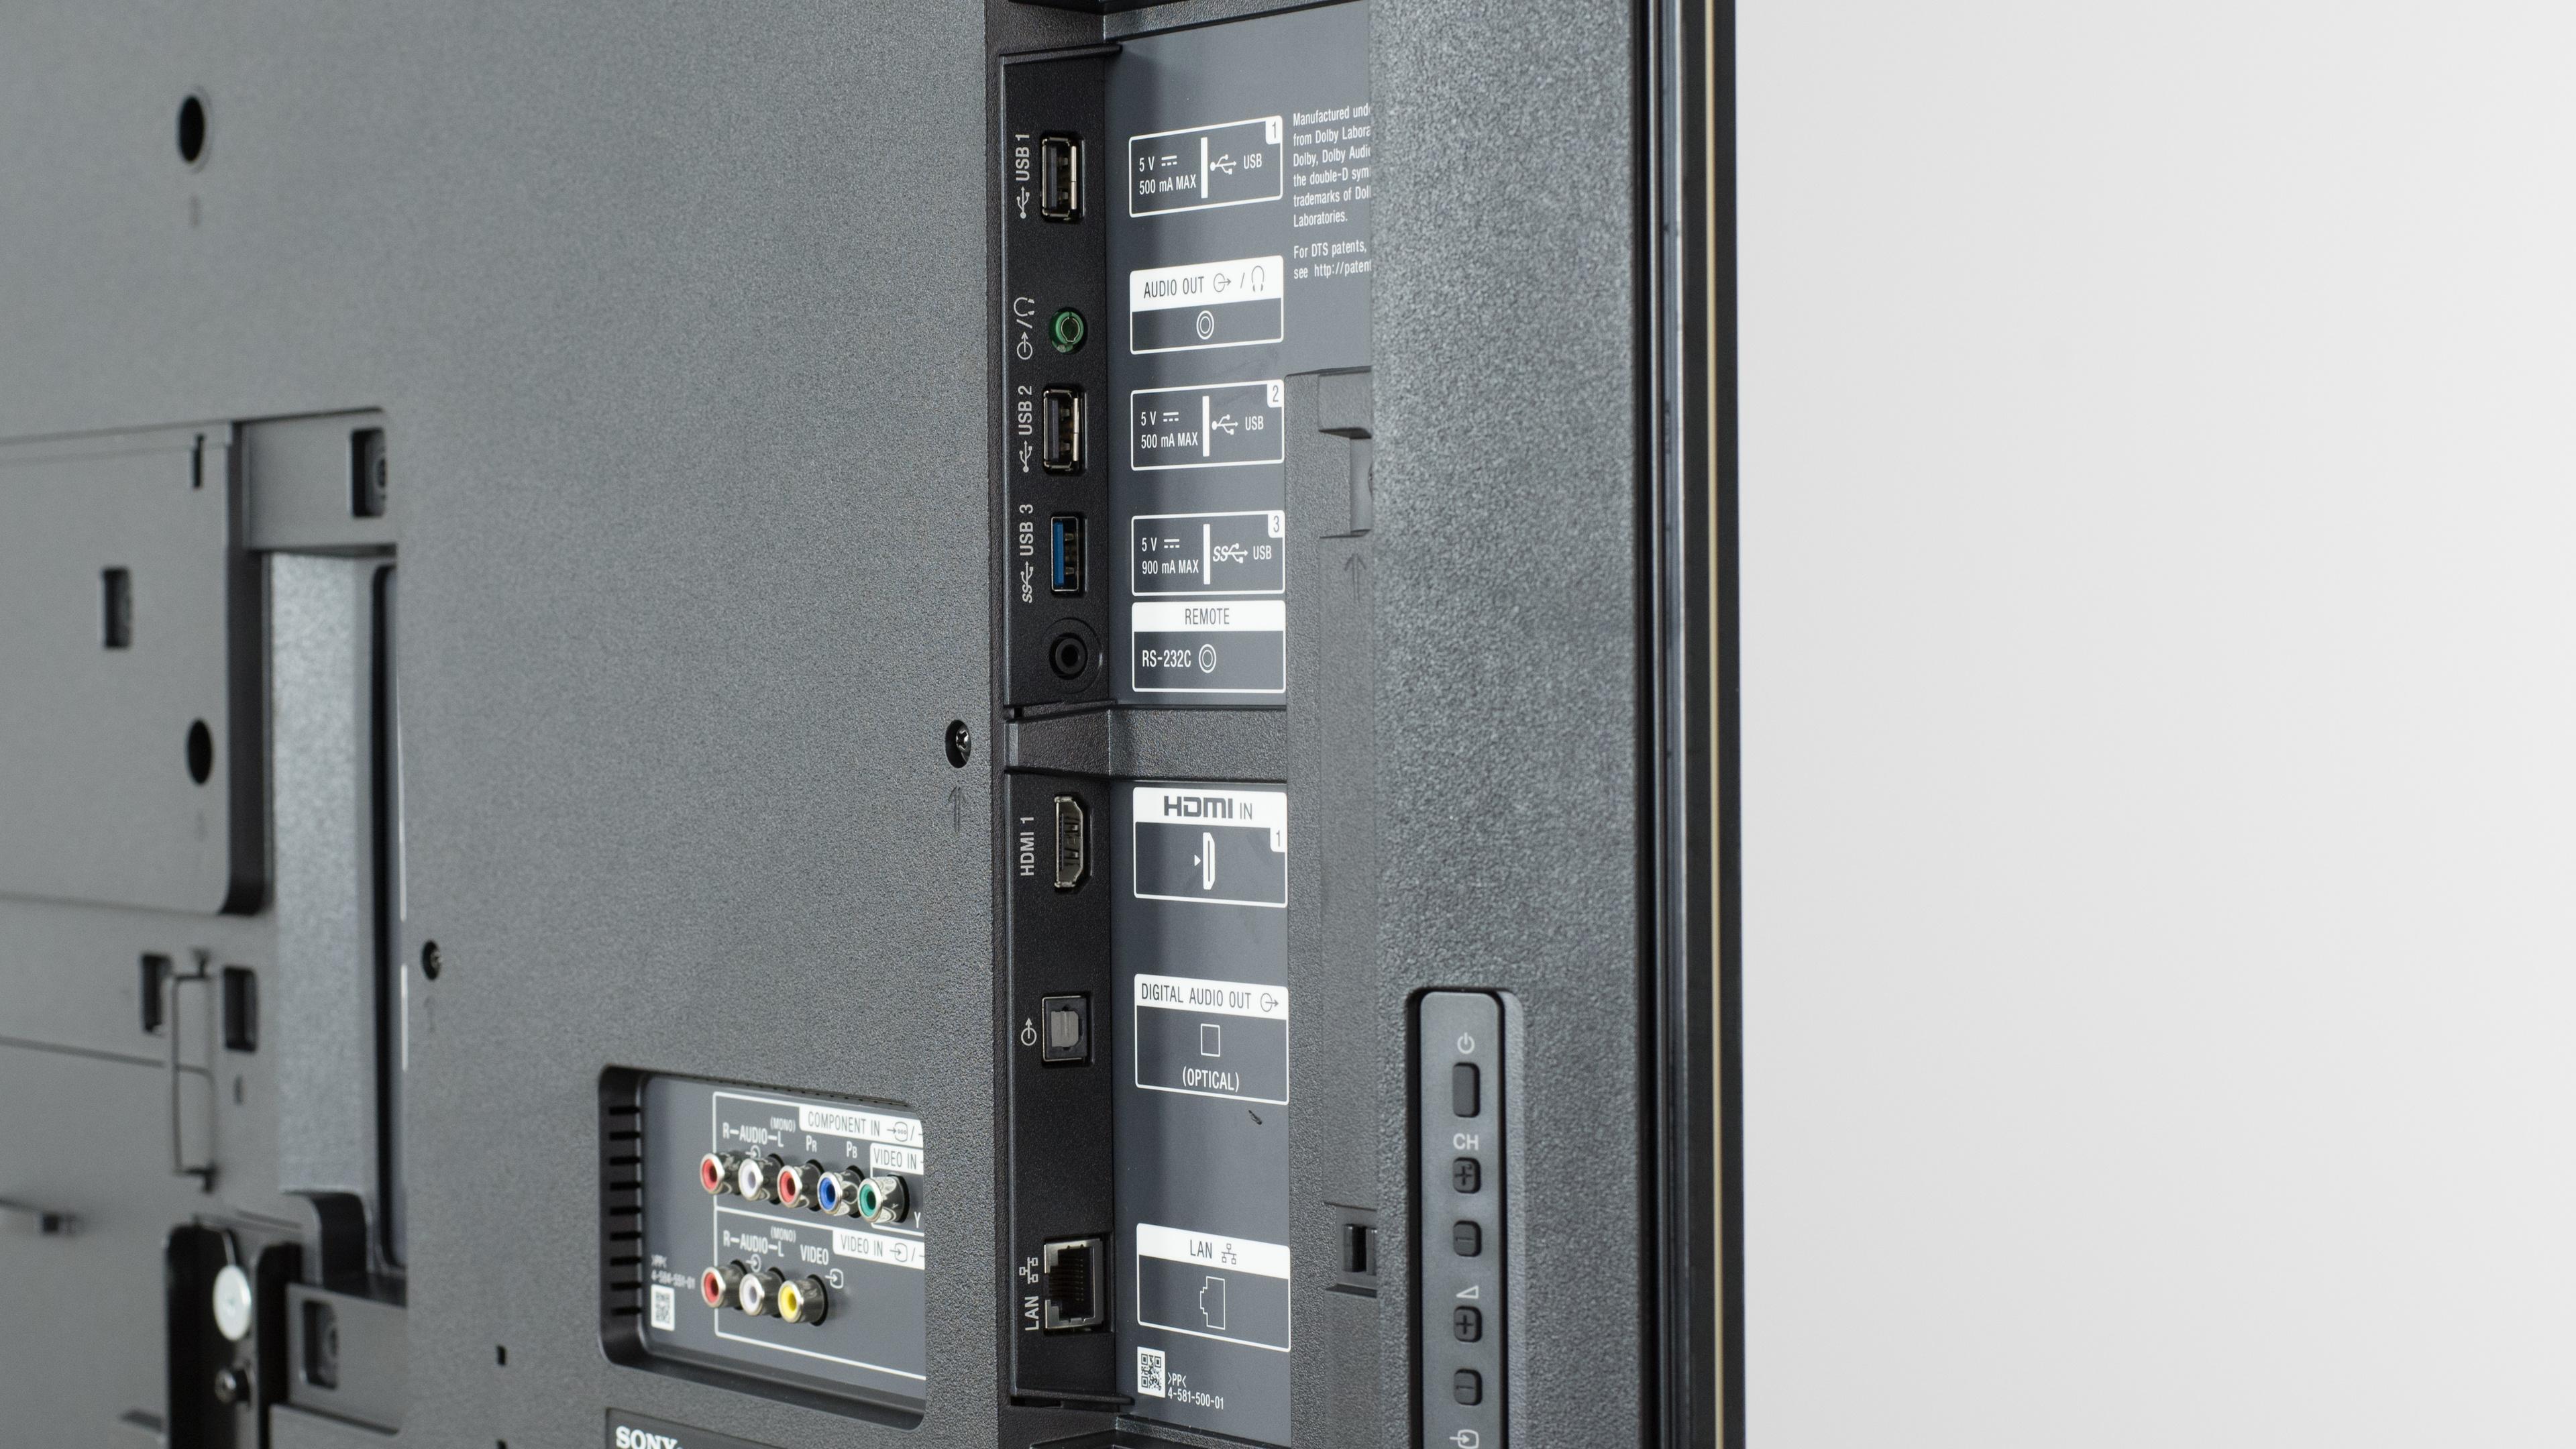 Sony X930d Review Xbr55x930d Xbr65x930d